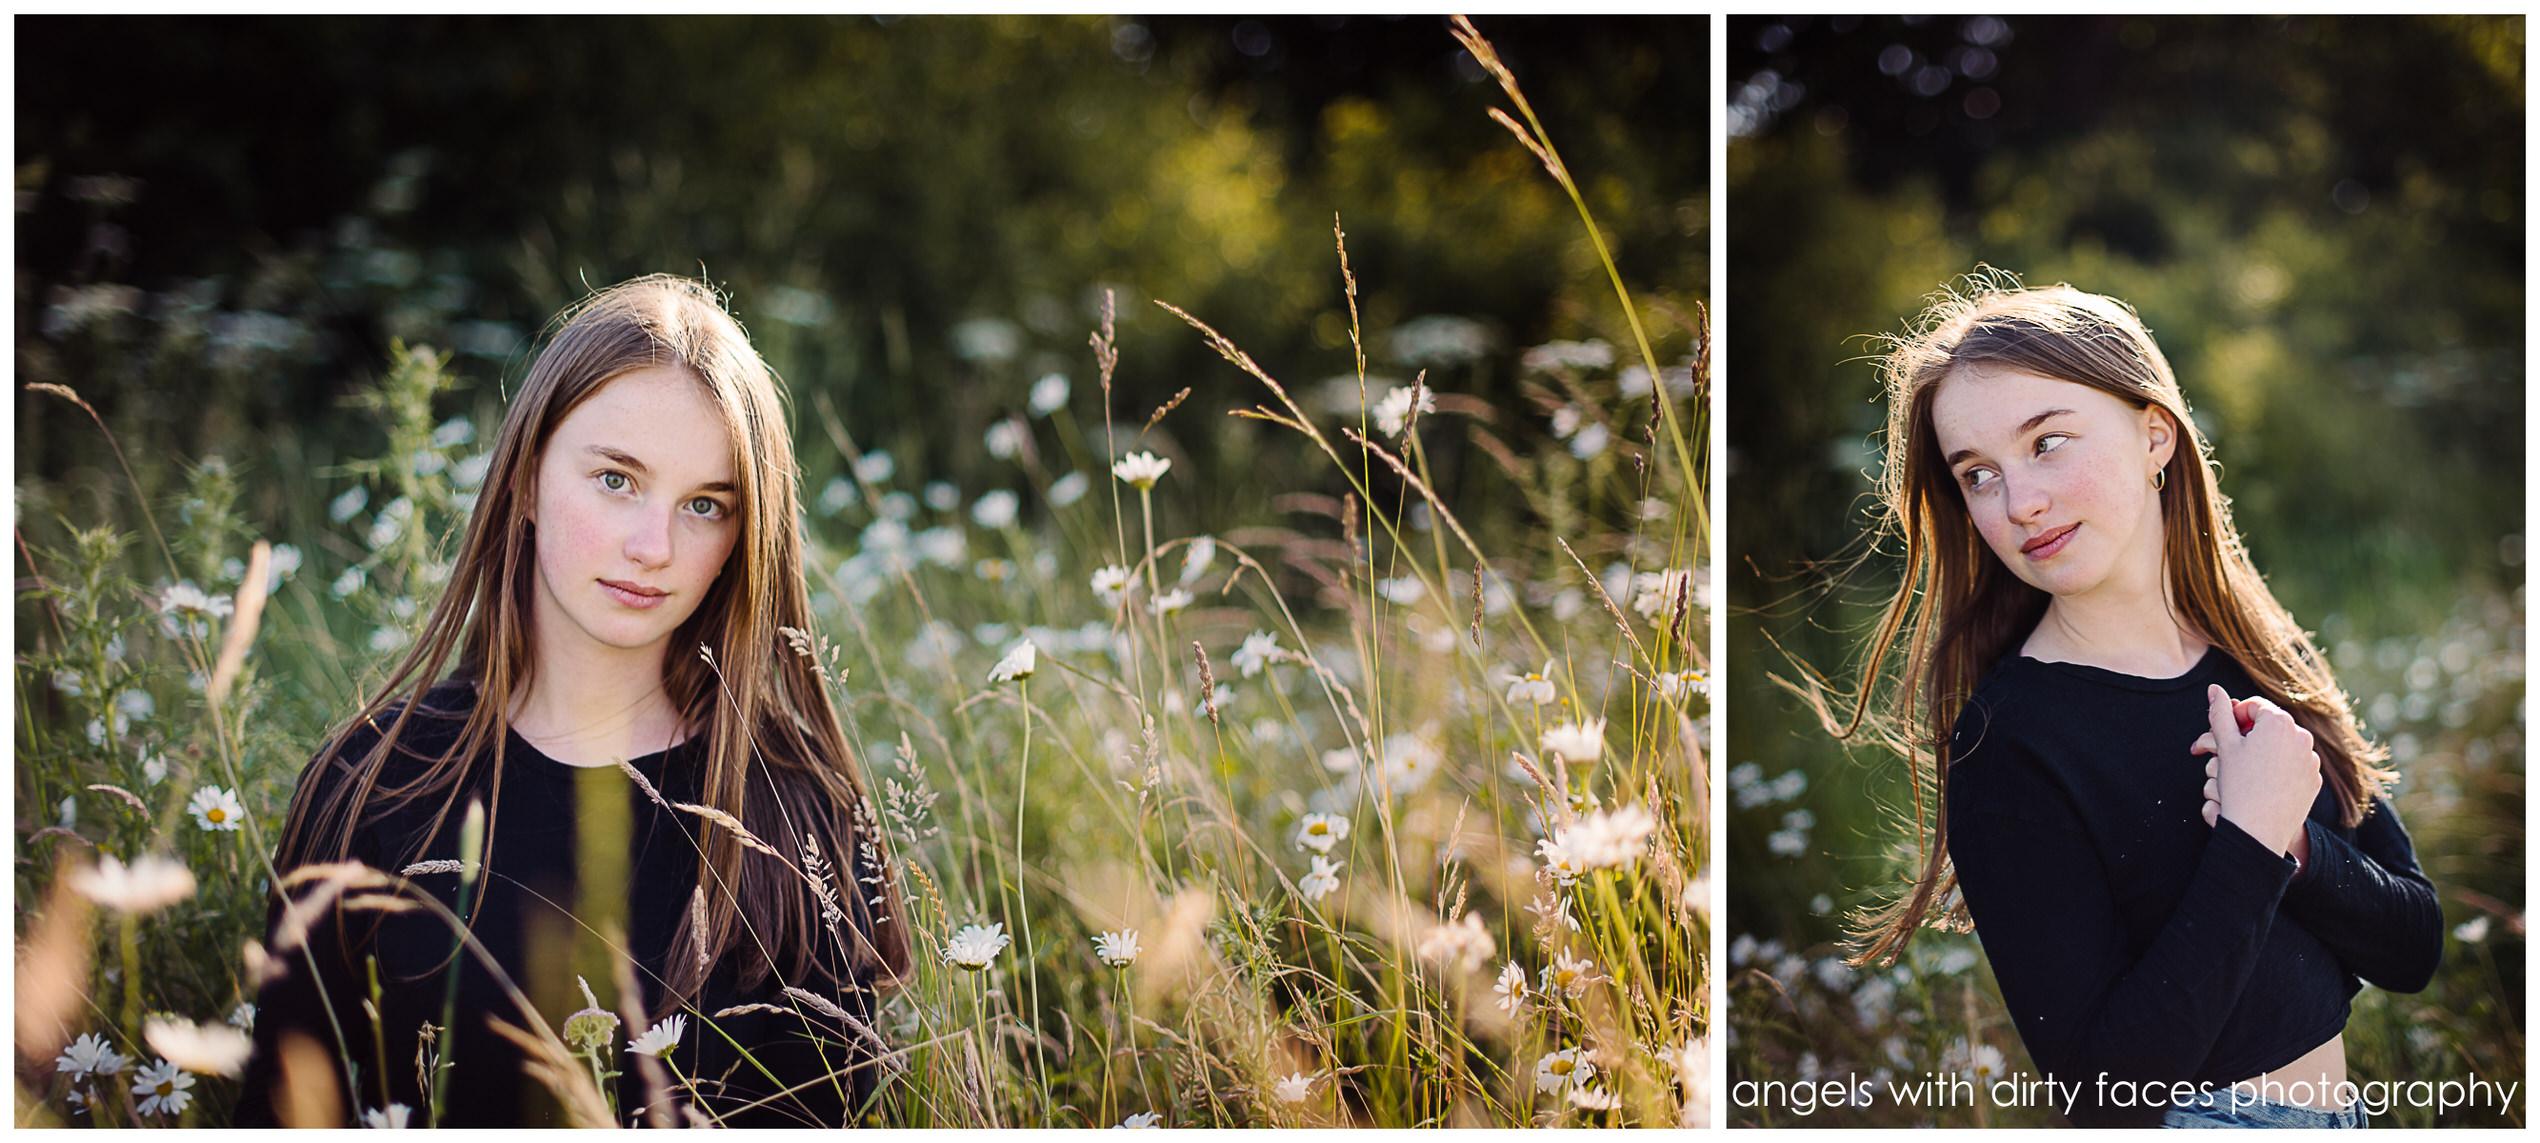 Summer Evening Mini Photo Sessions